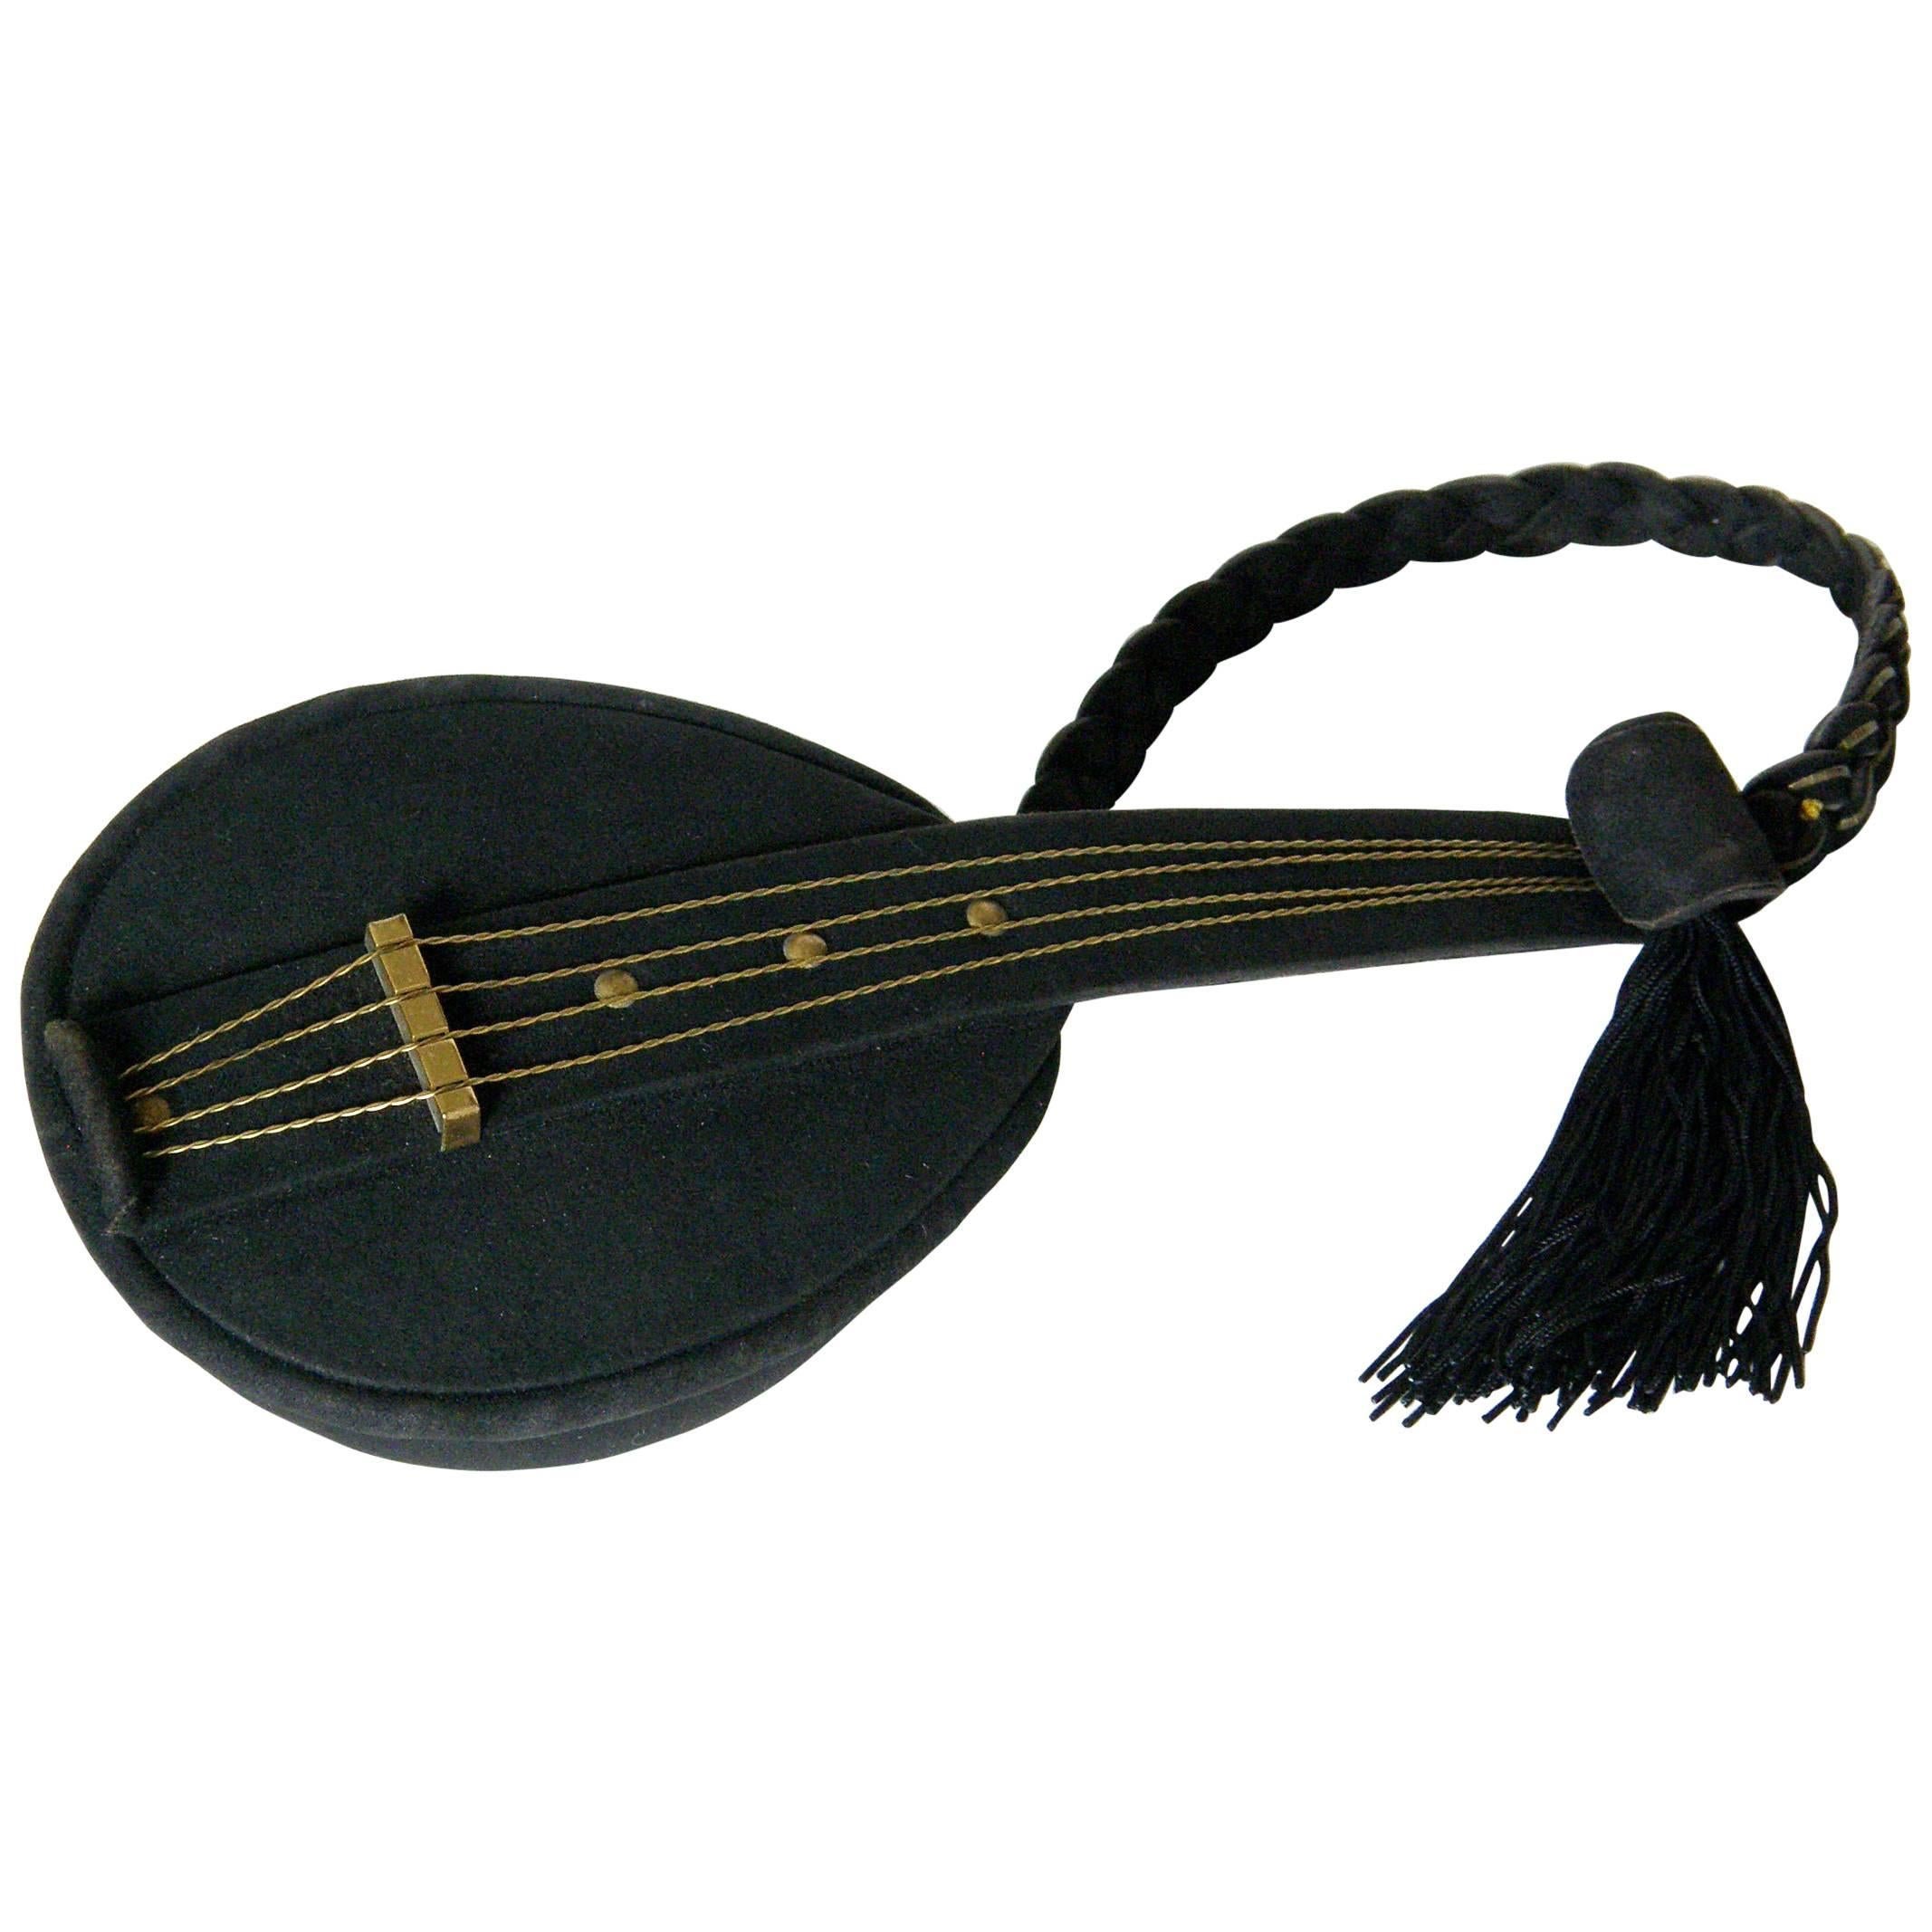 1stdibs Jeanne Bernard Of Paris Black Suede Mandolin Shaped Handbag FJw5Y